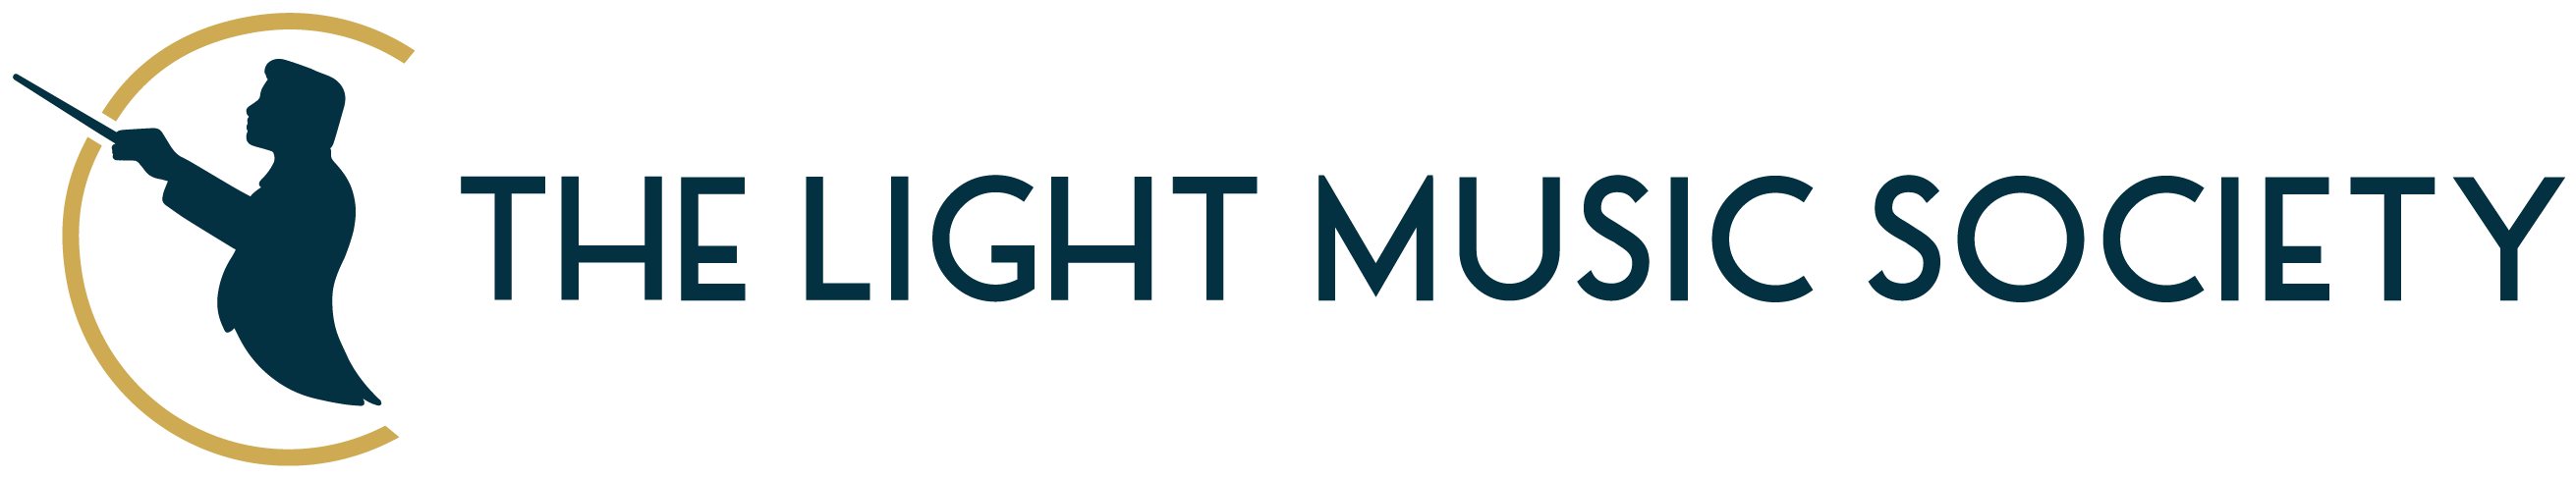 The Light Music Society